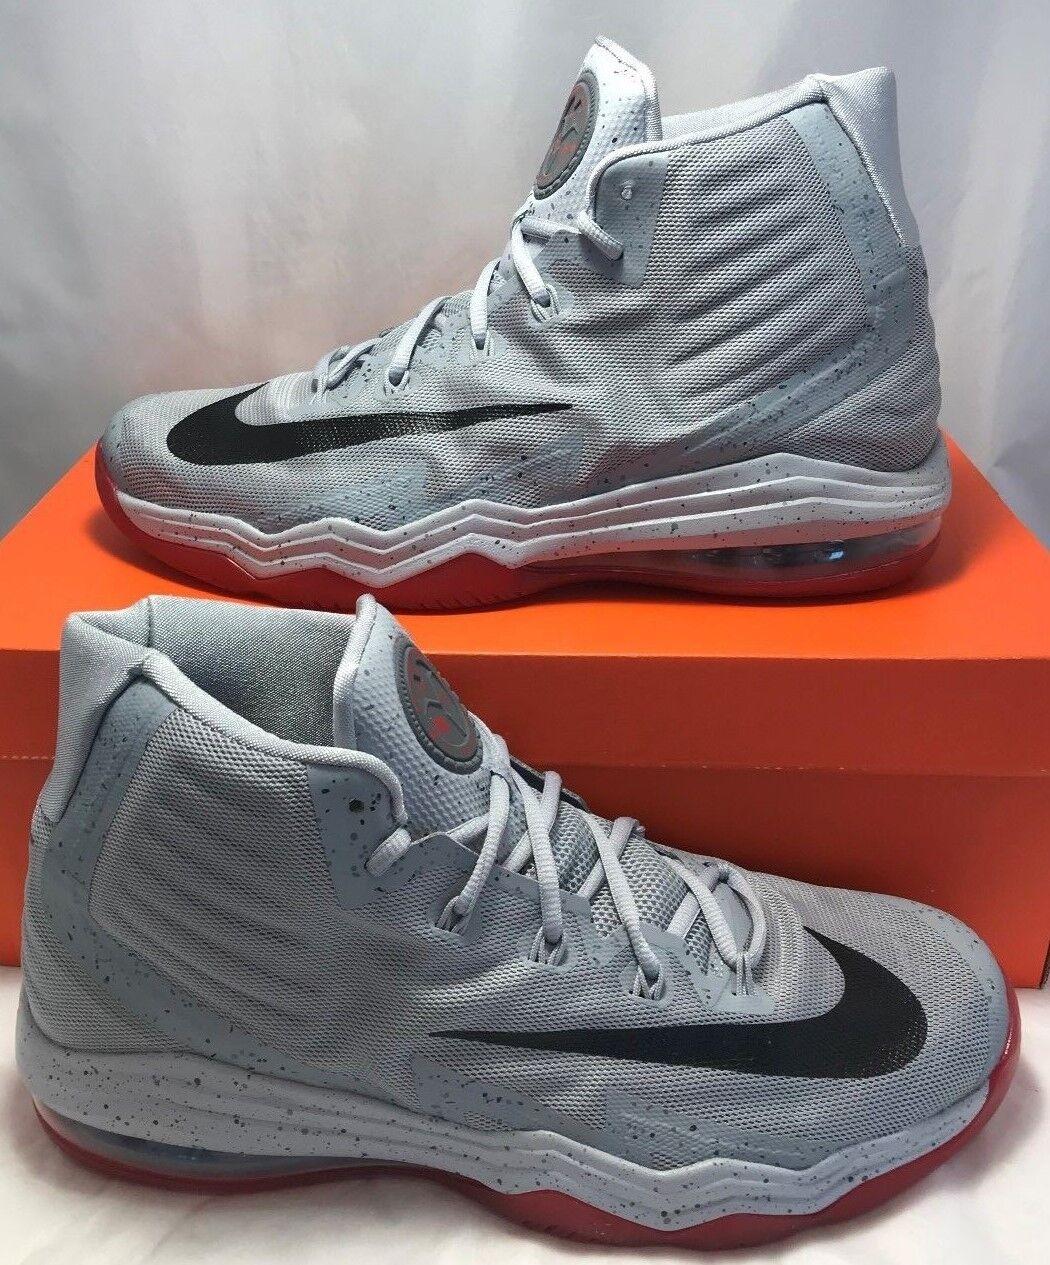 Nike air max Uomo dimensioni anthony 7,5 audacia 2016 pe anthony dimensioni davis grey scarpe da basket 2cea88